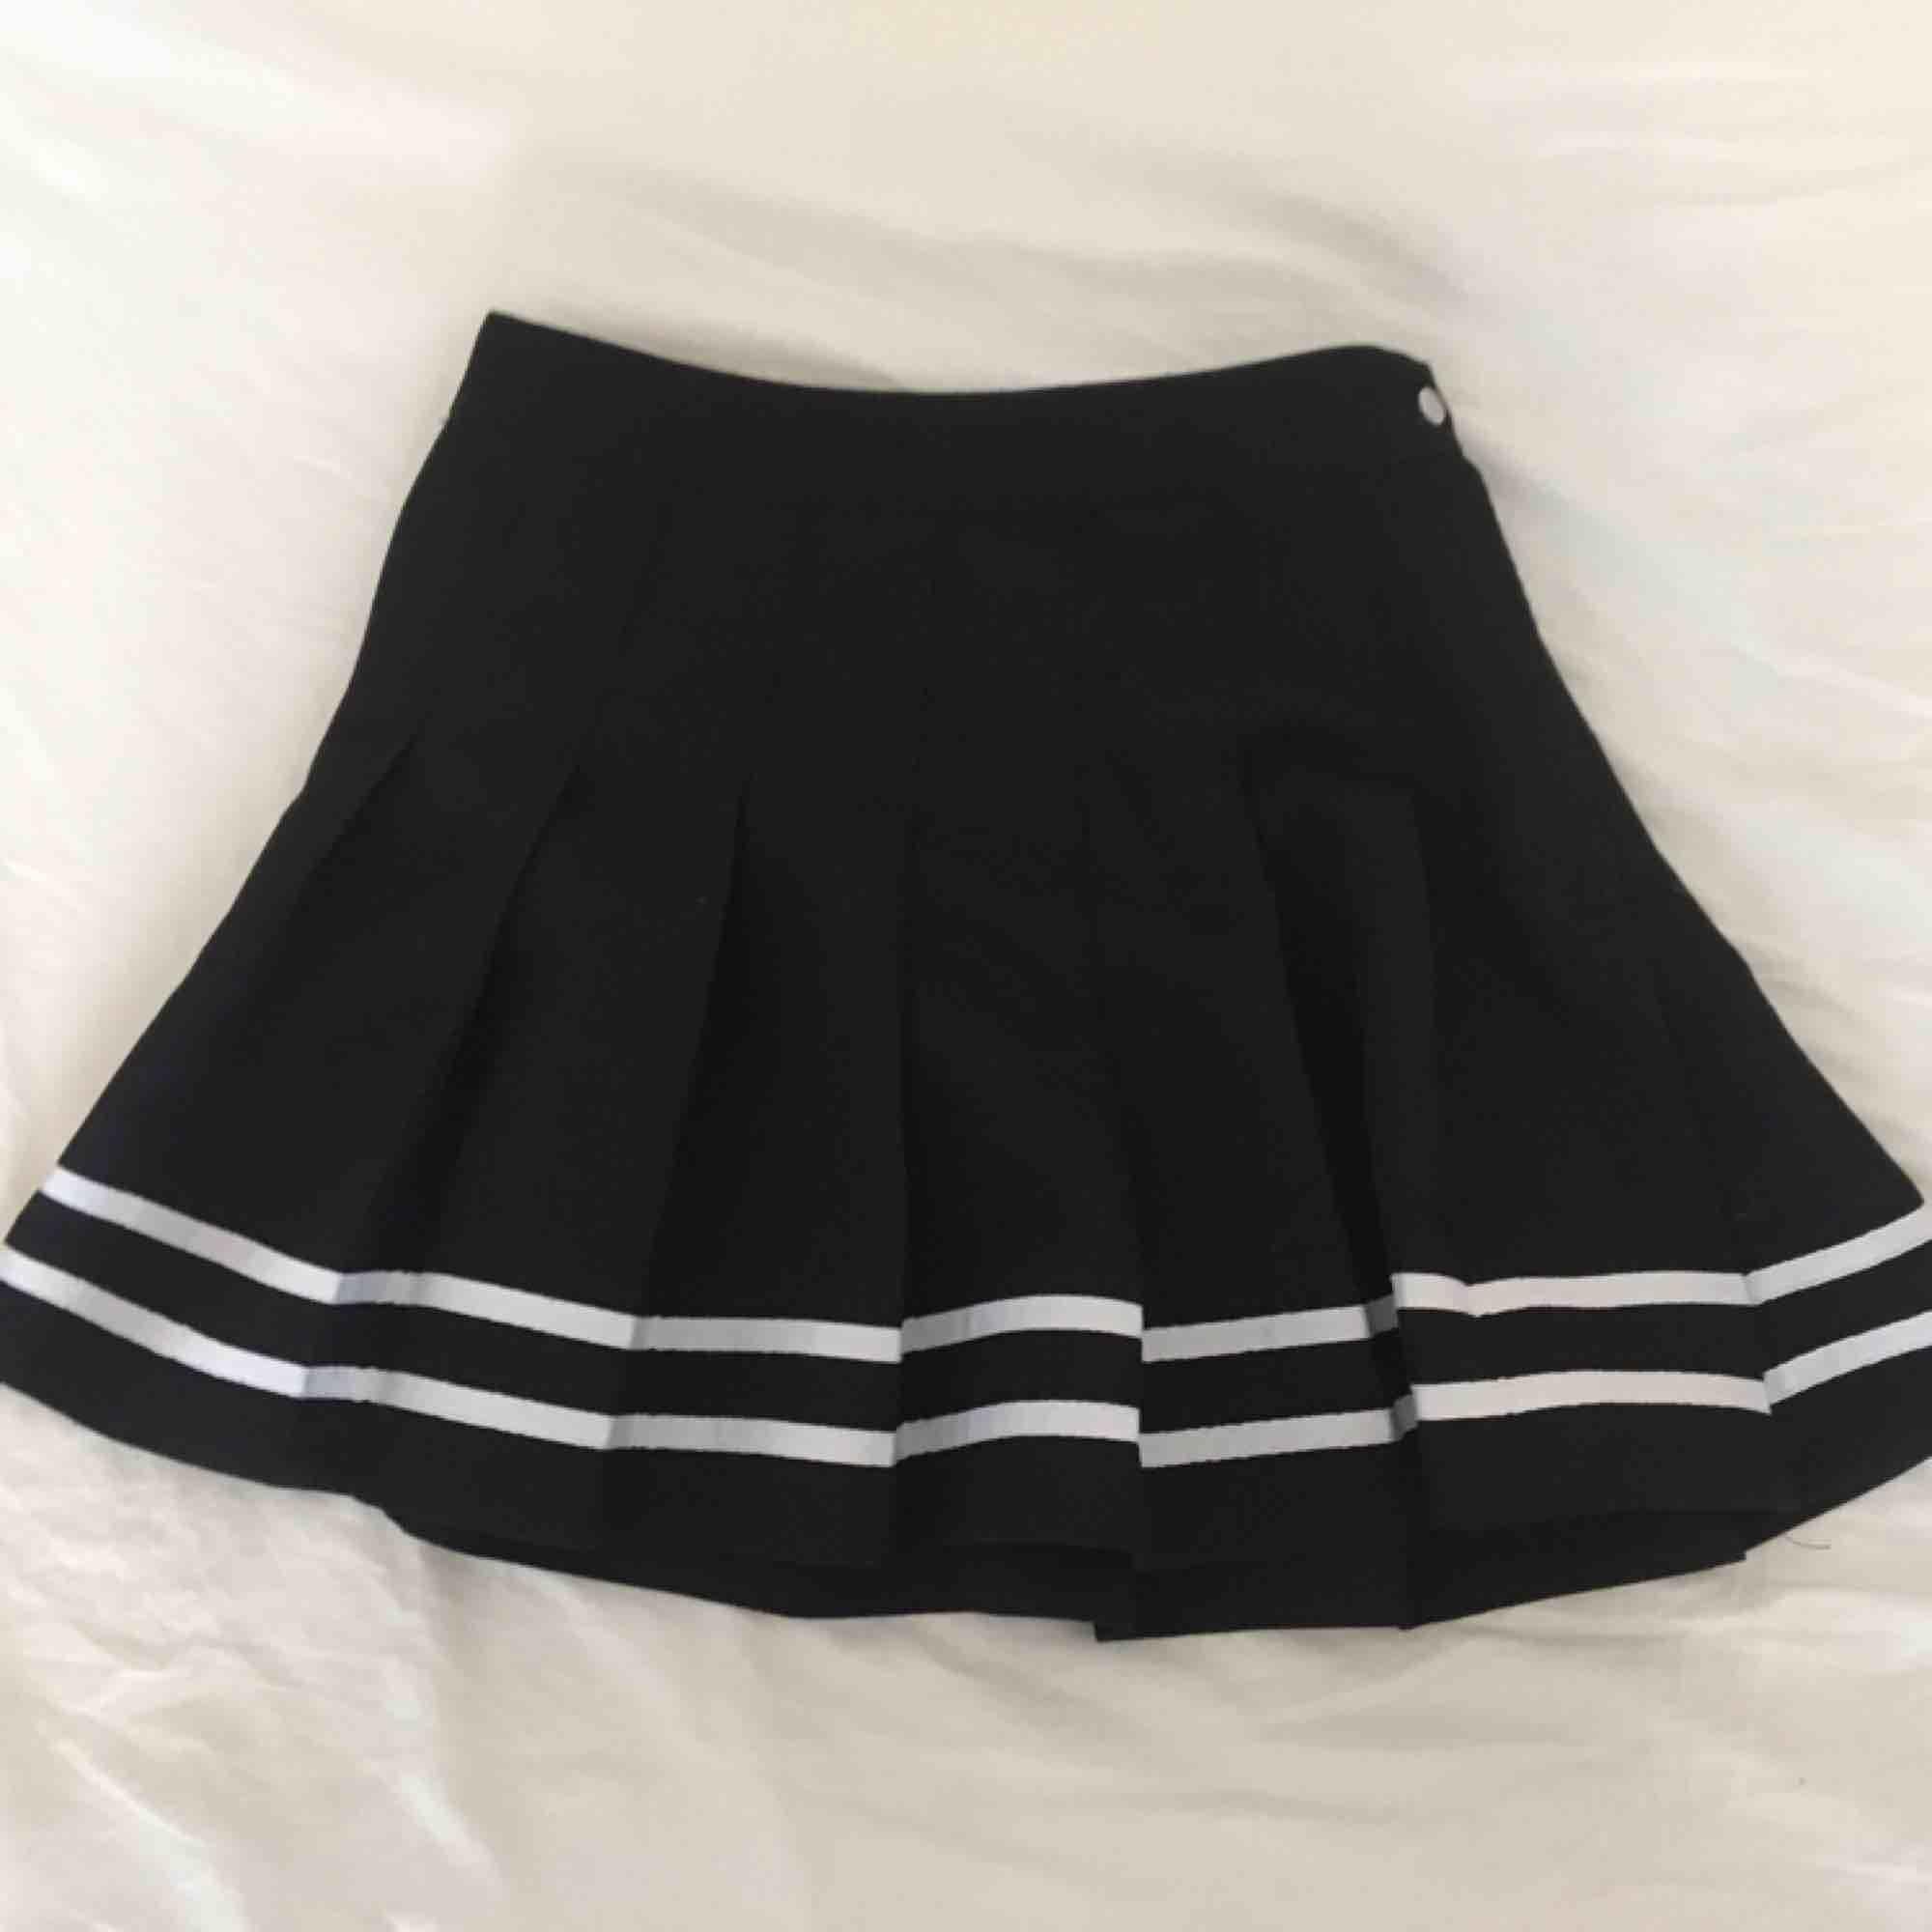 Fin skater kjol från H&M i svart med vit rand detalj. Storlek 36 💖. Kjolar.